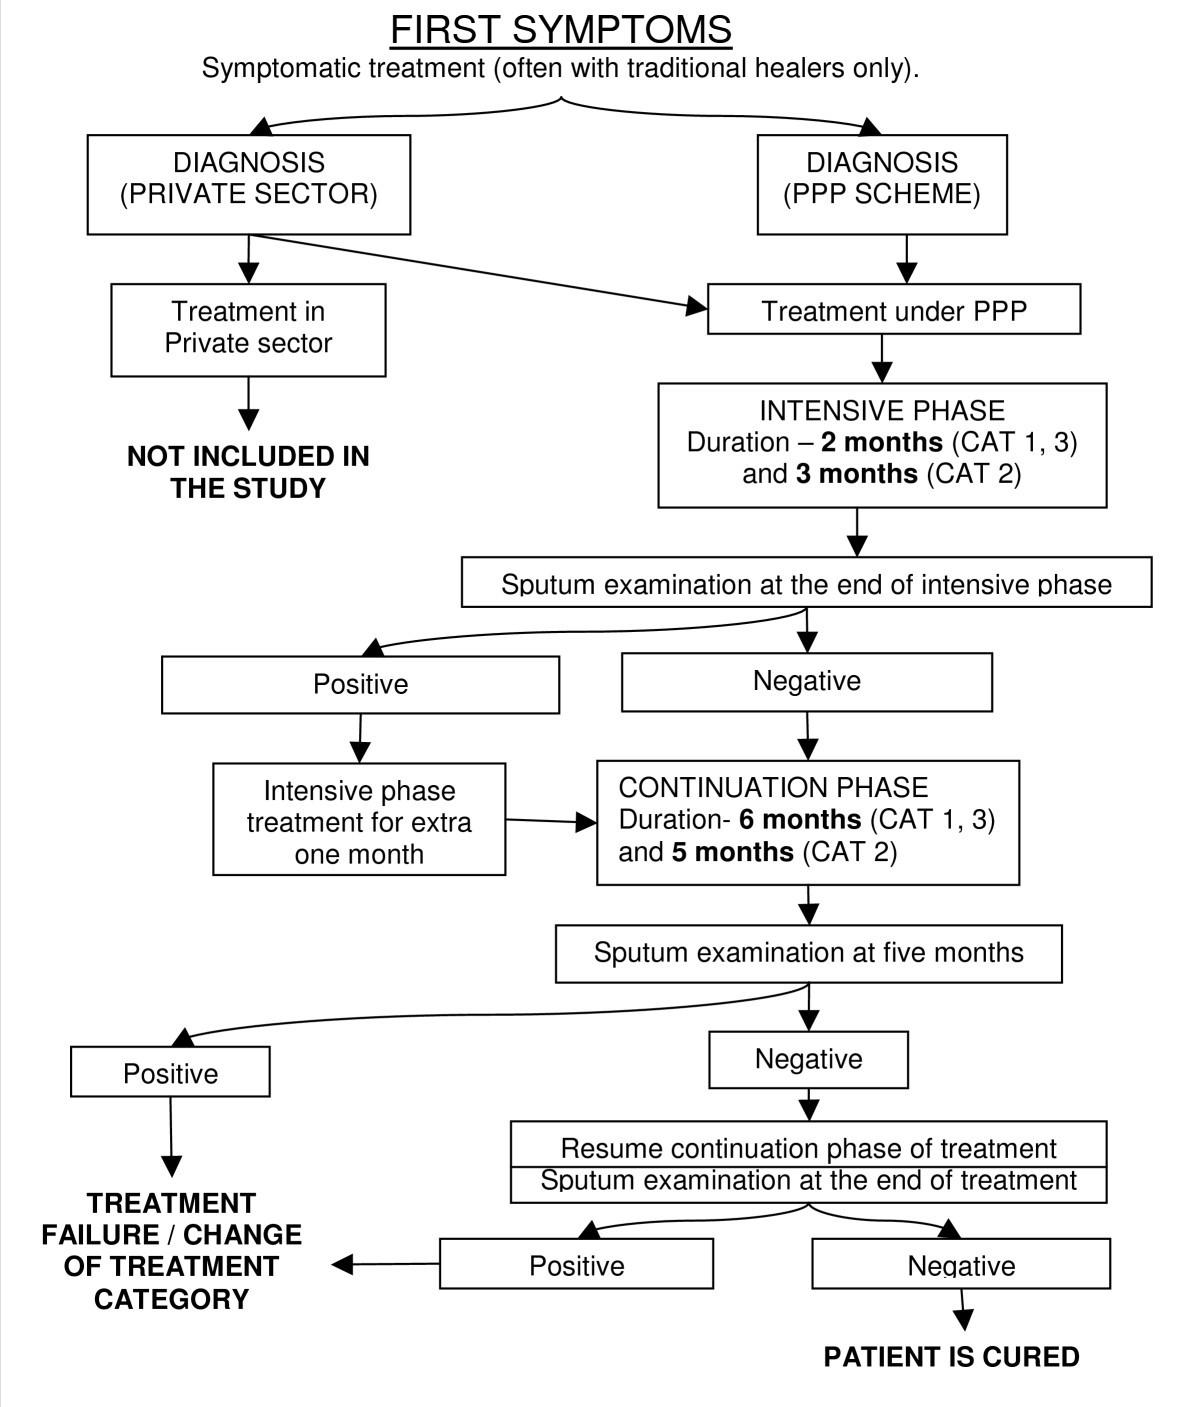 Symptoms of ppp